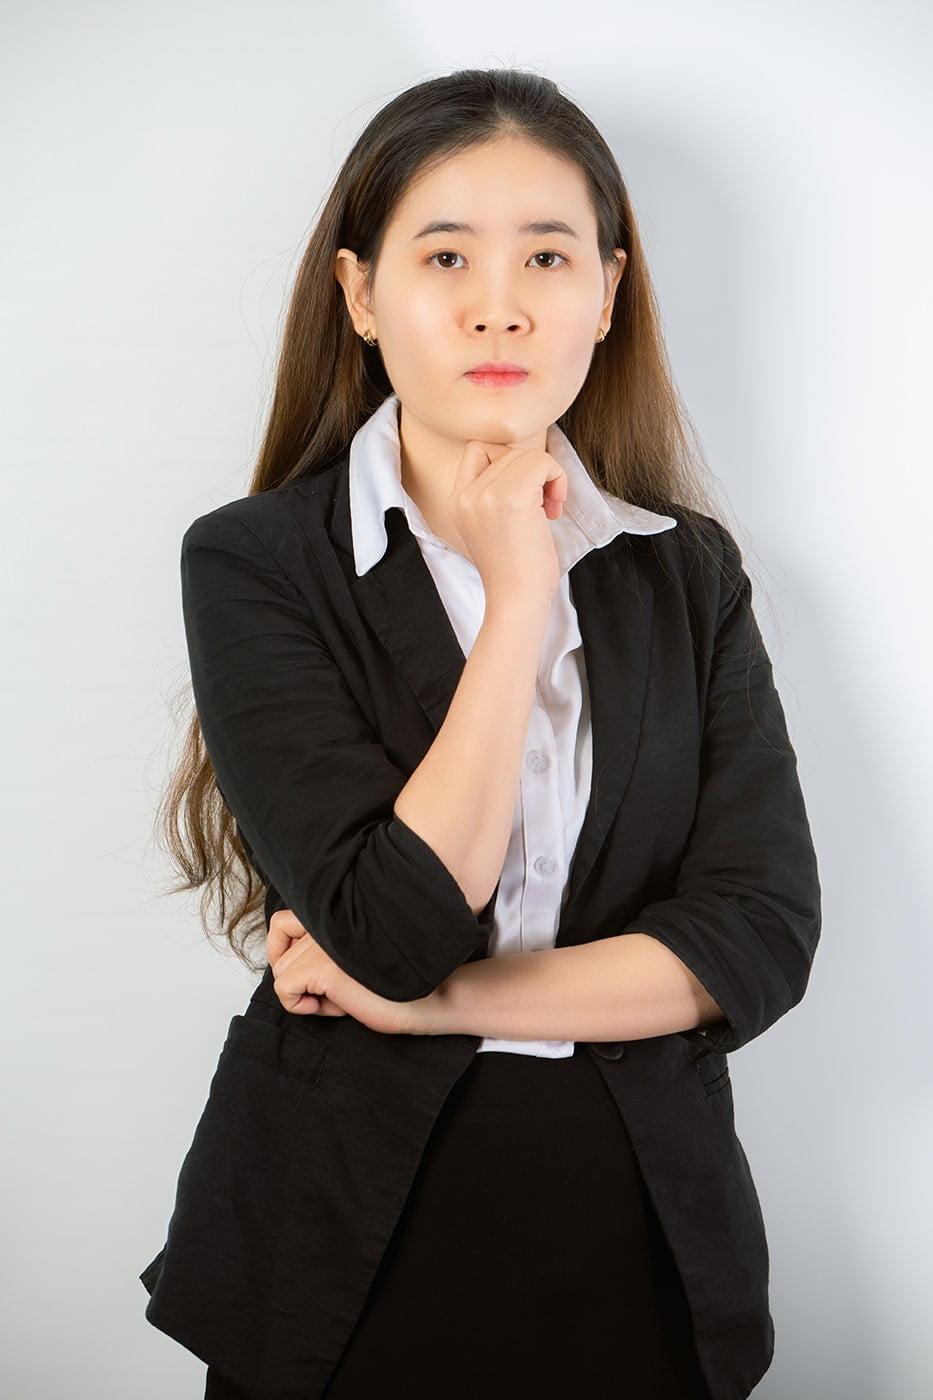 Profile cong ty 23 - Album chụp ảnh profile công ty Luật Dzungsrt Law - HThao Studio